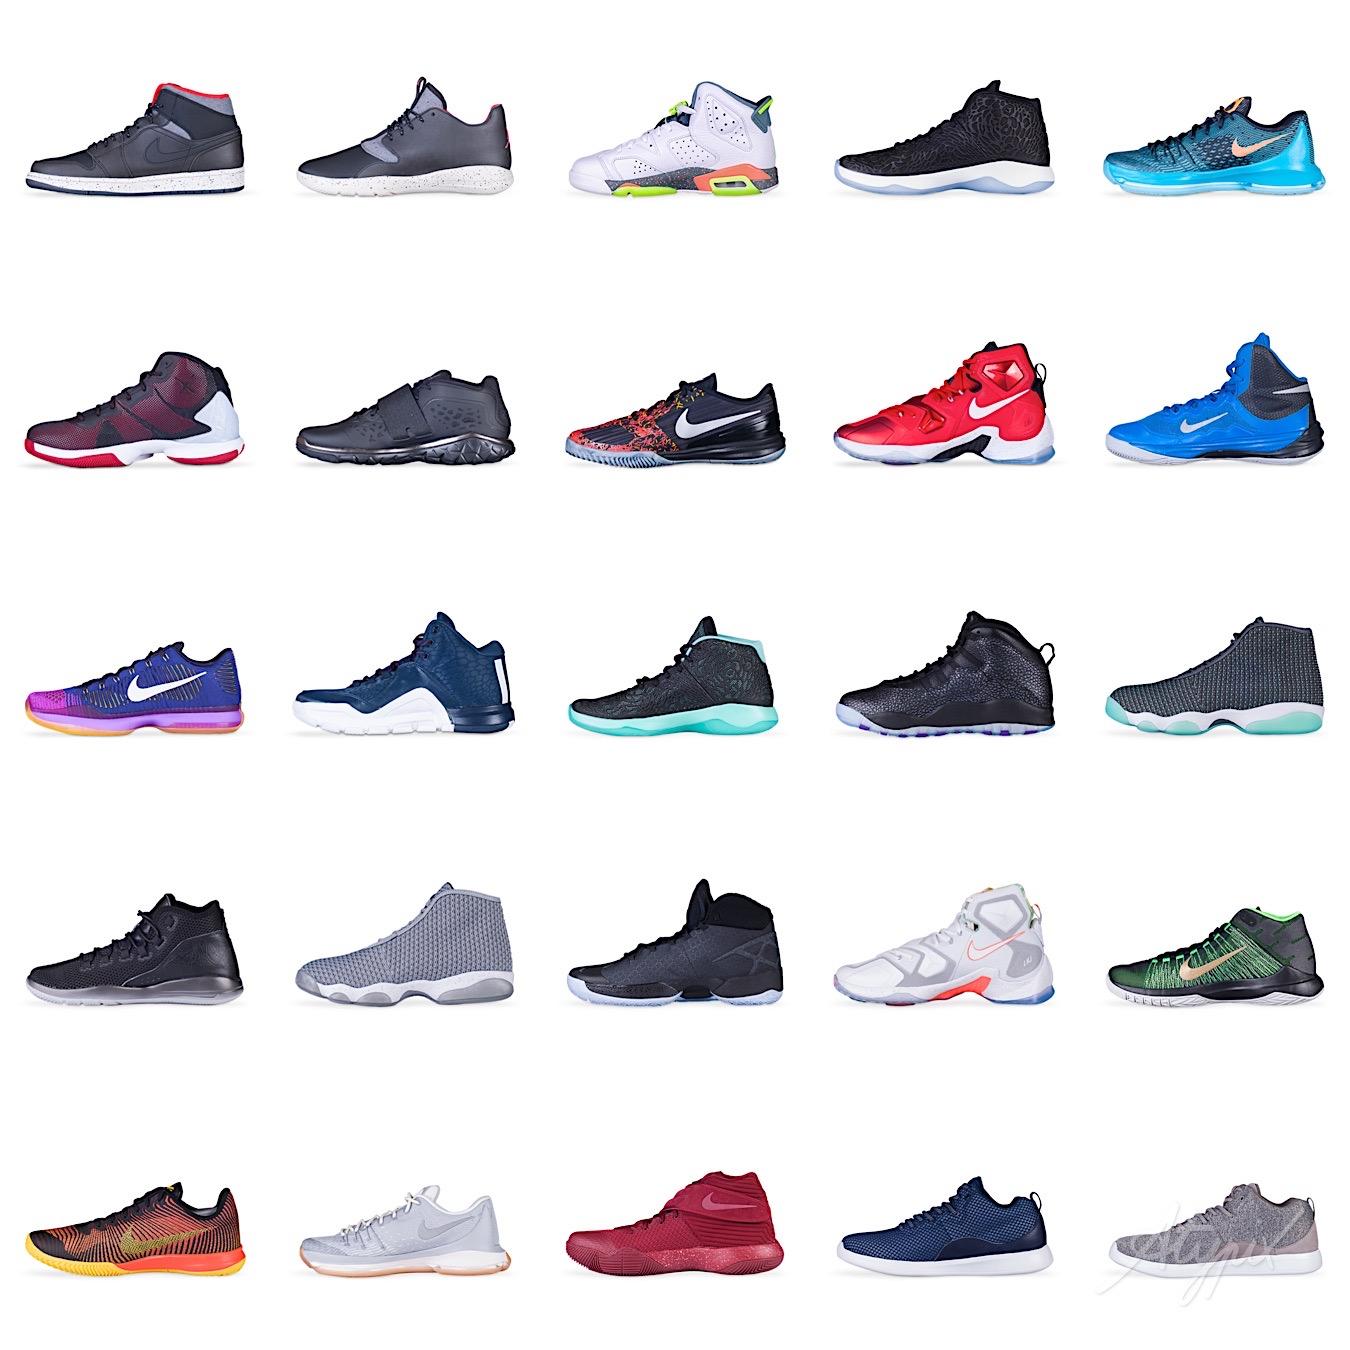 vente en ligne chaussure macadam basket